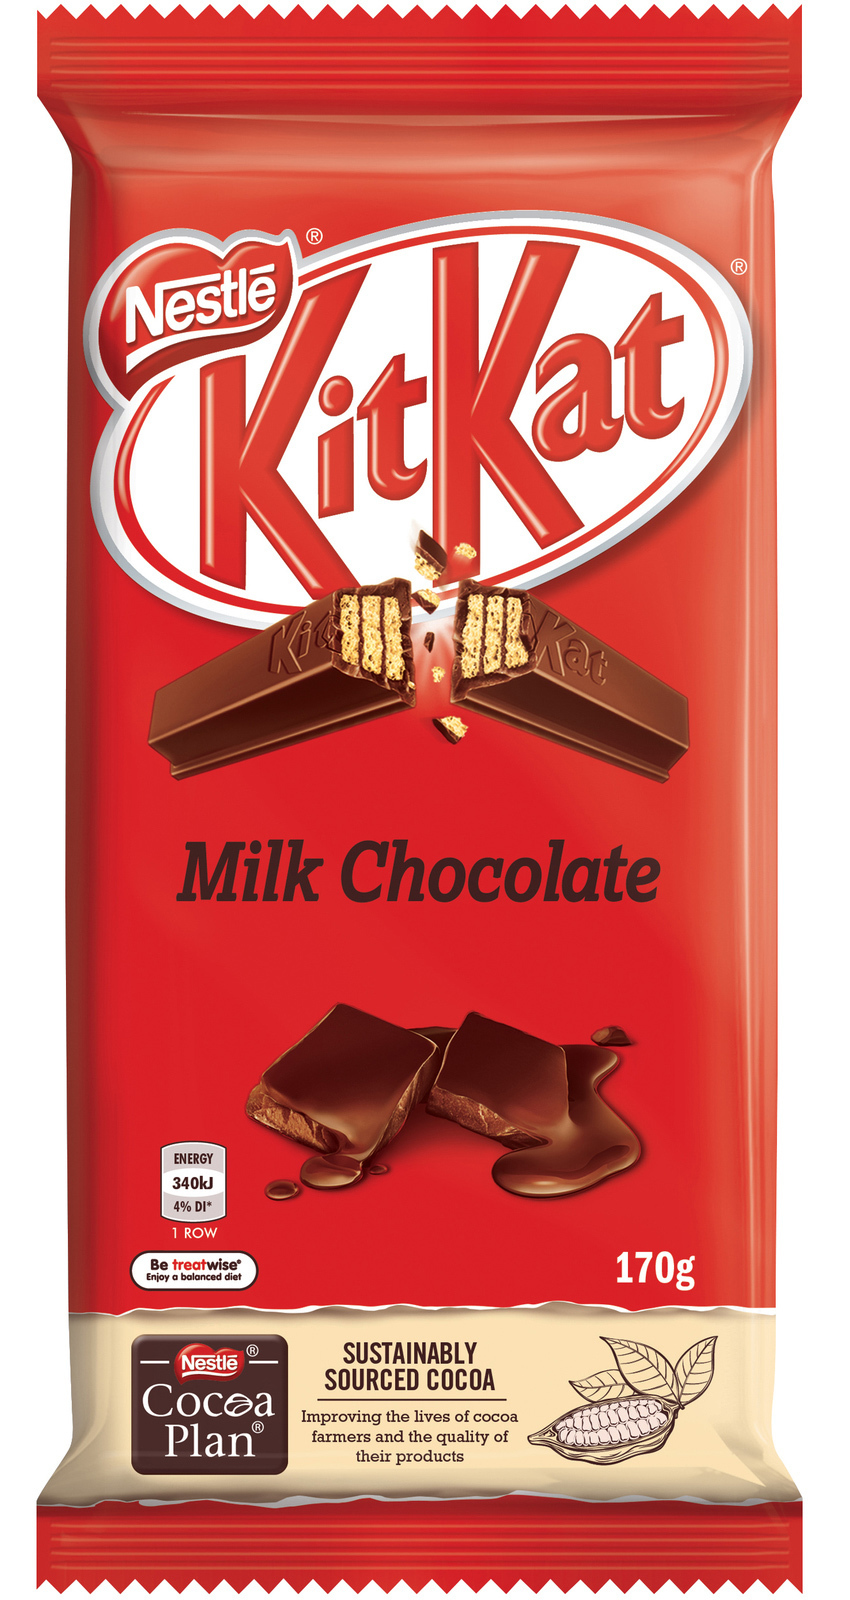 KitKat: Milk Chocolate Block 170g (12 Pack) image